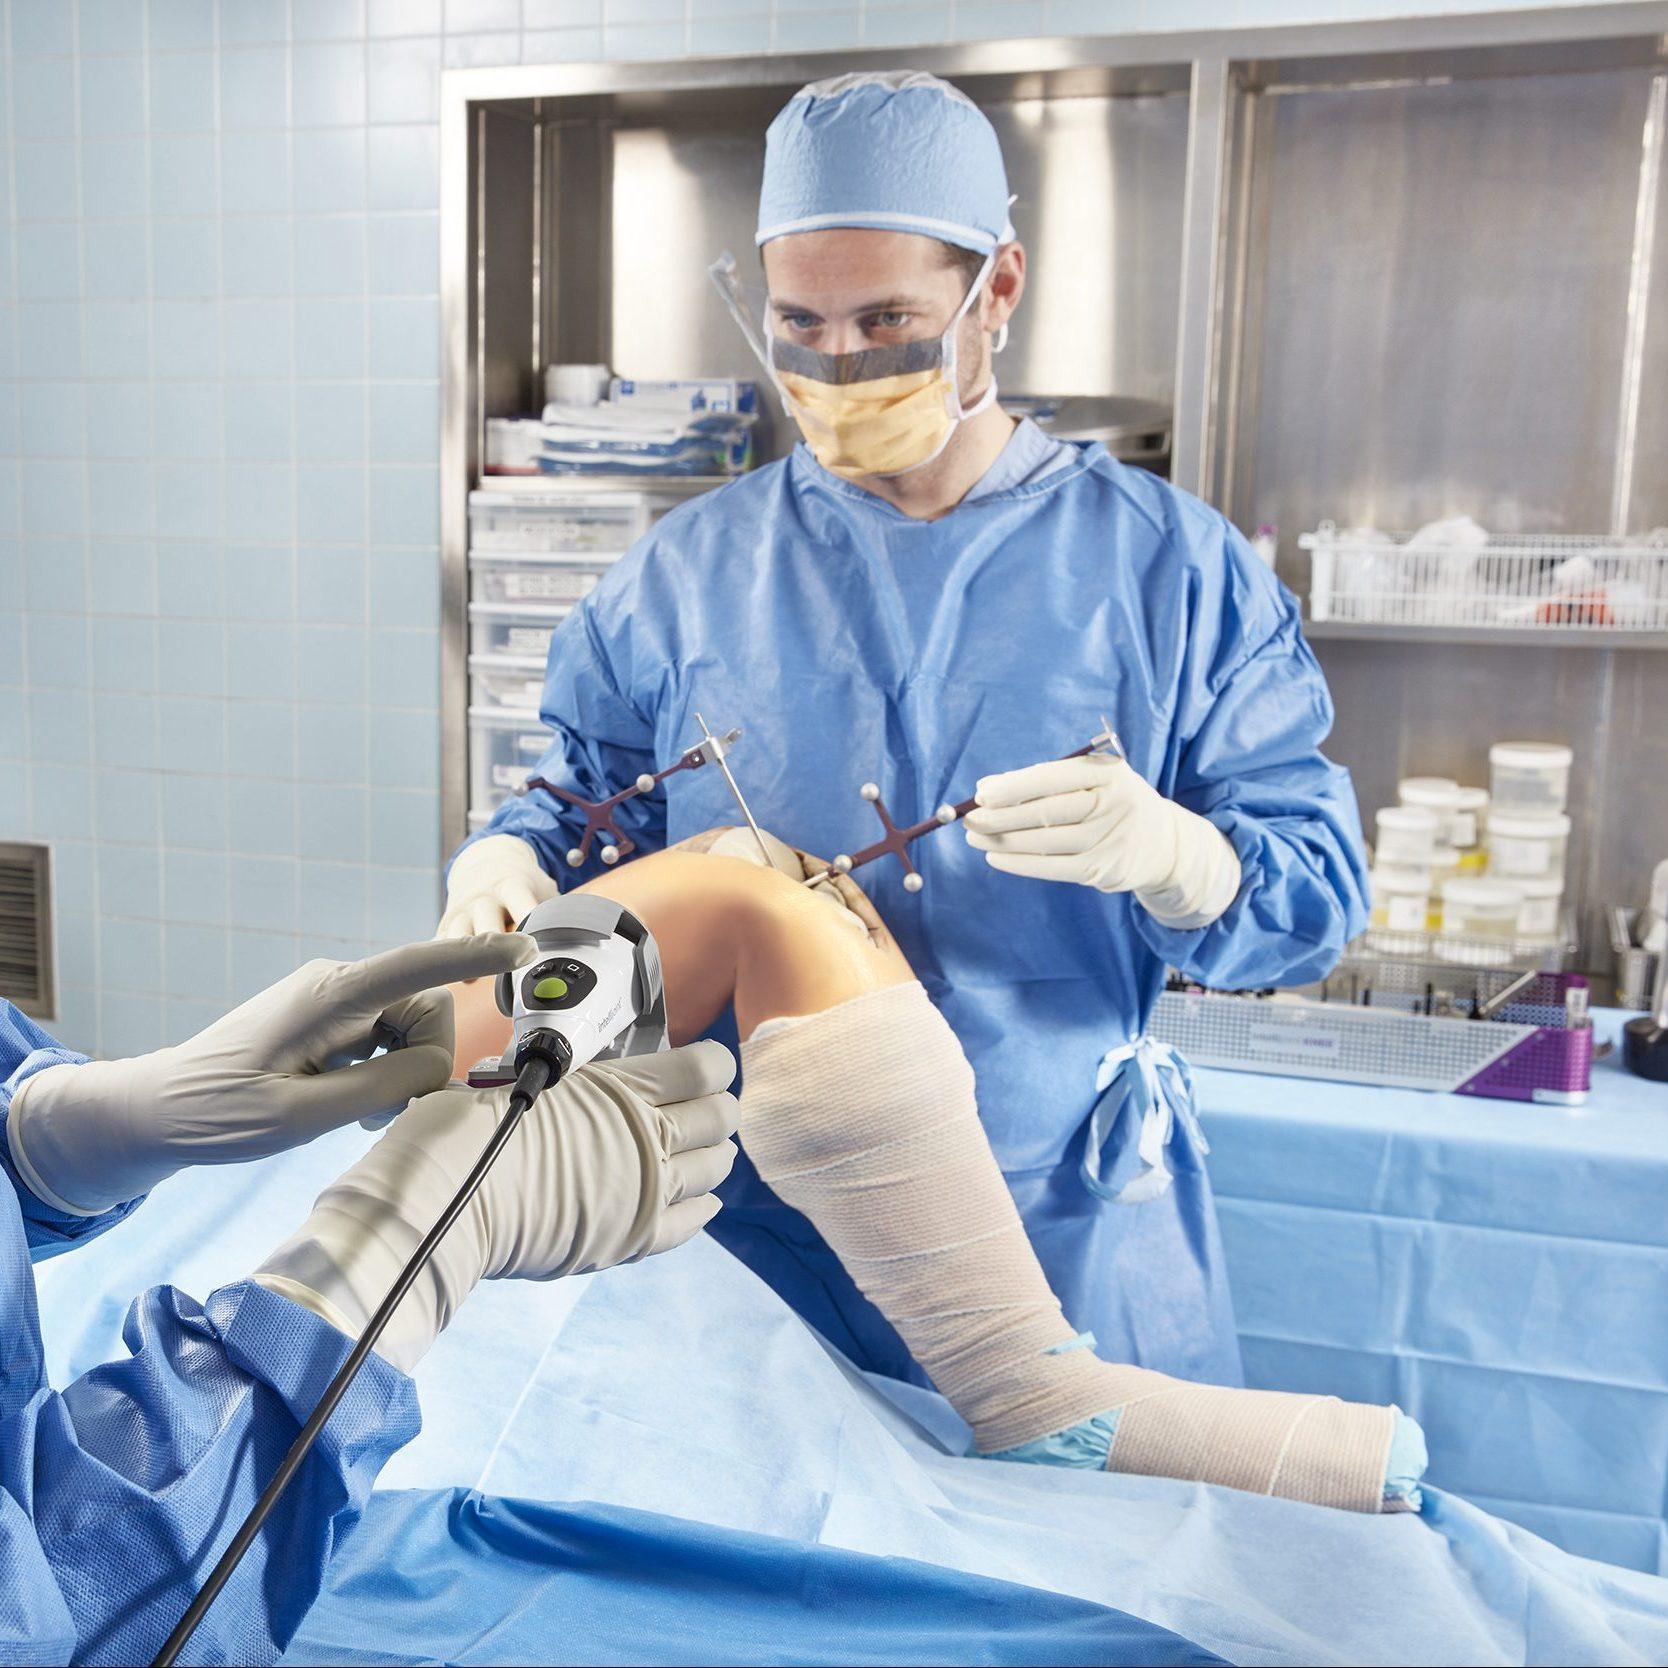 surgery room - knee